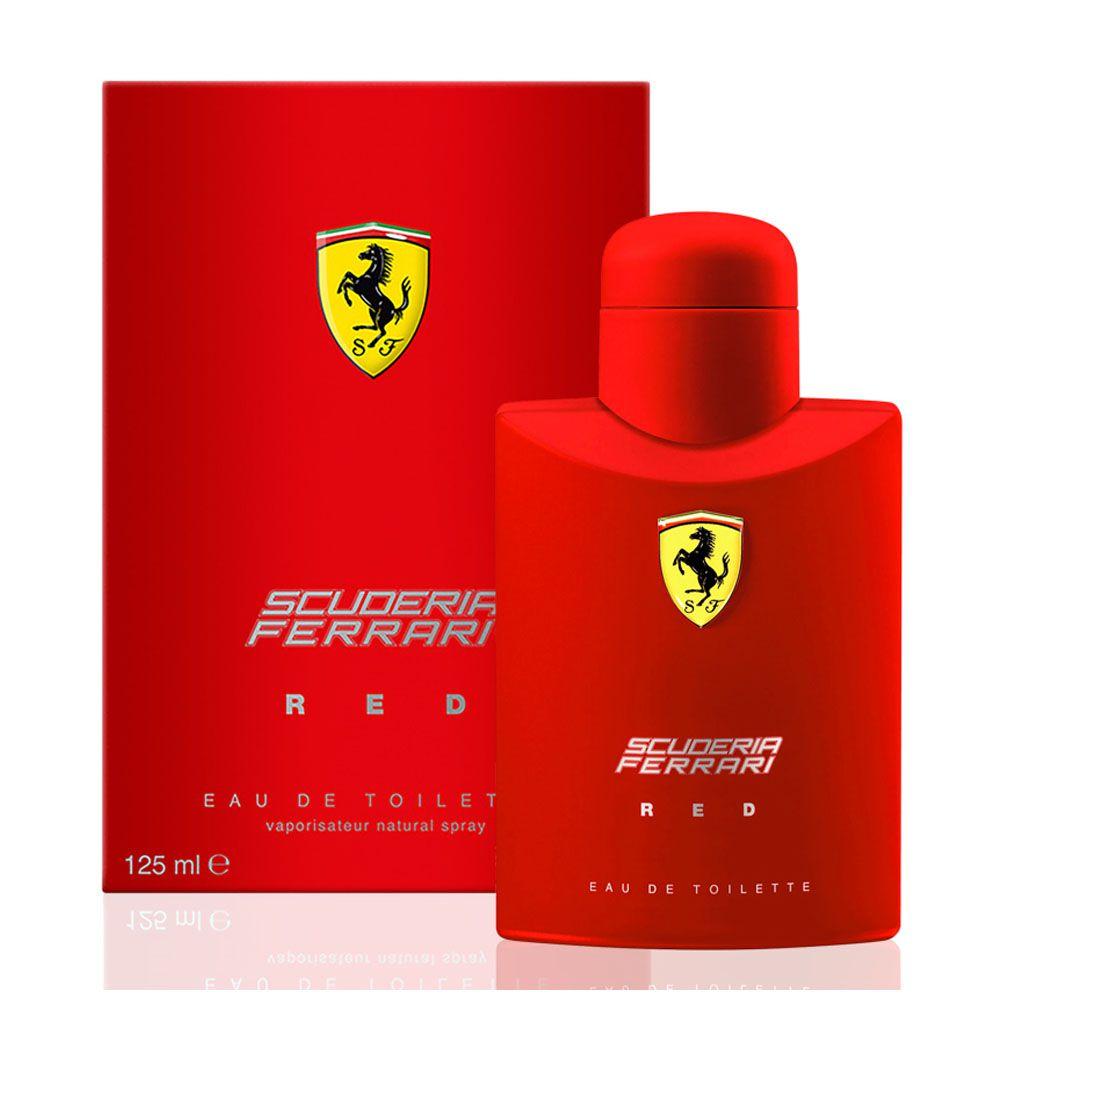 Perfume Scuderia Ferrari Red 125ml Eau de Toilette